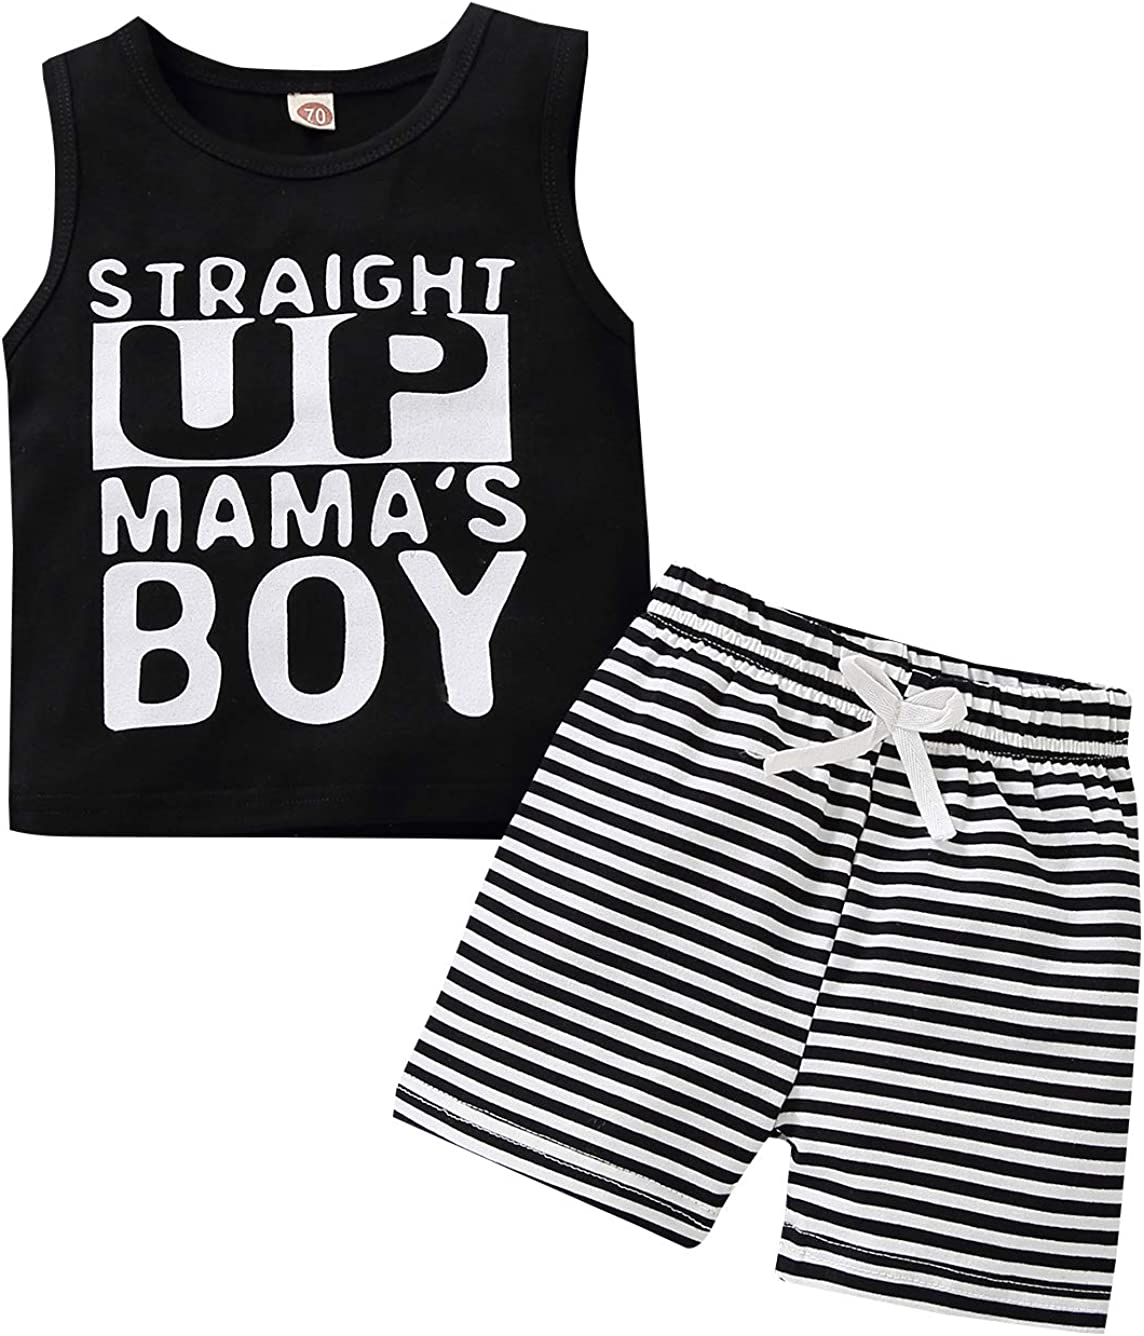 Jsmiten Kids 2 Pieces Shorts Set Baby Boy Summer Outfit Set Holiday Clothes Set